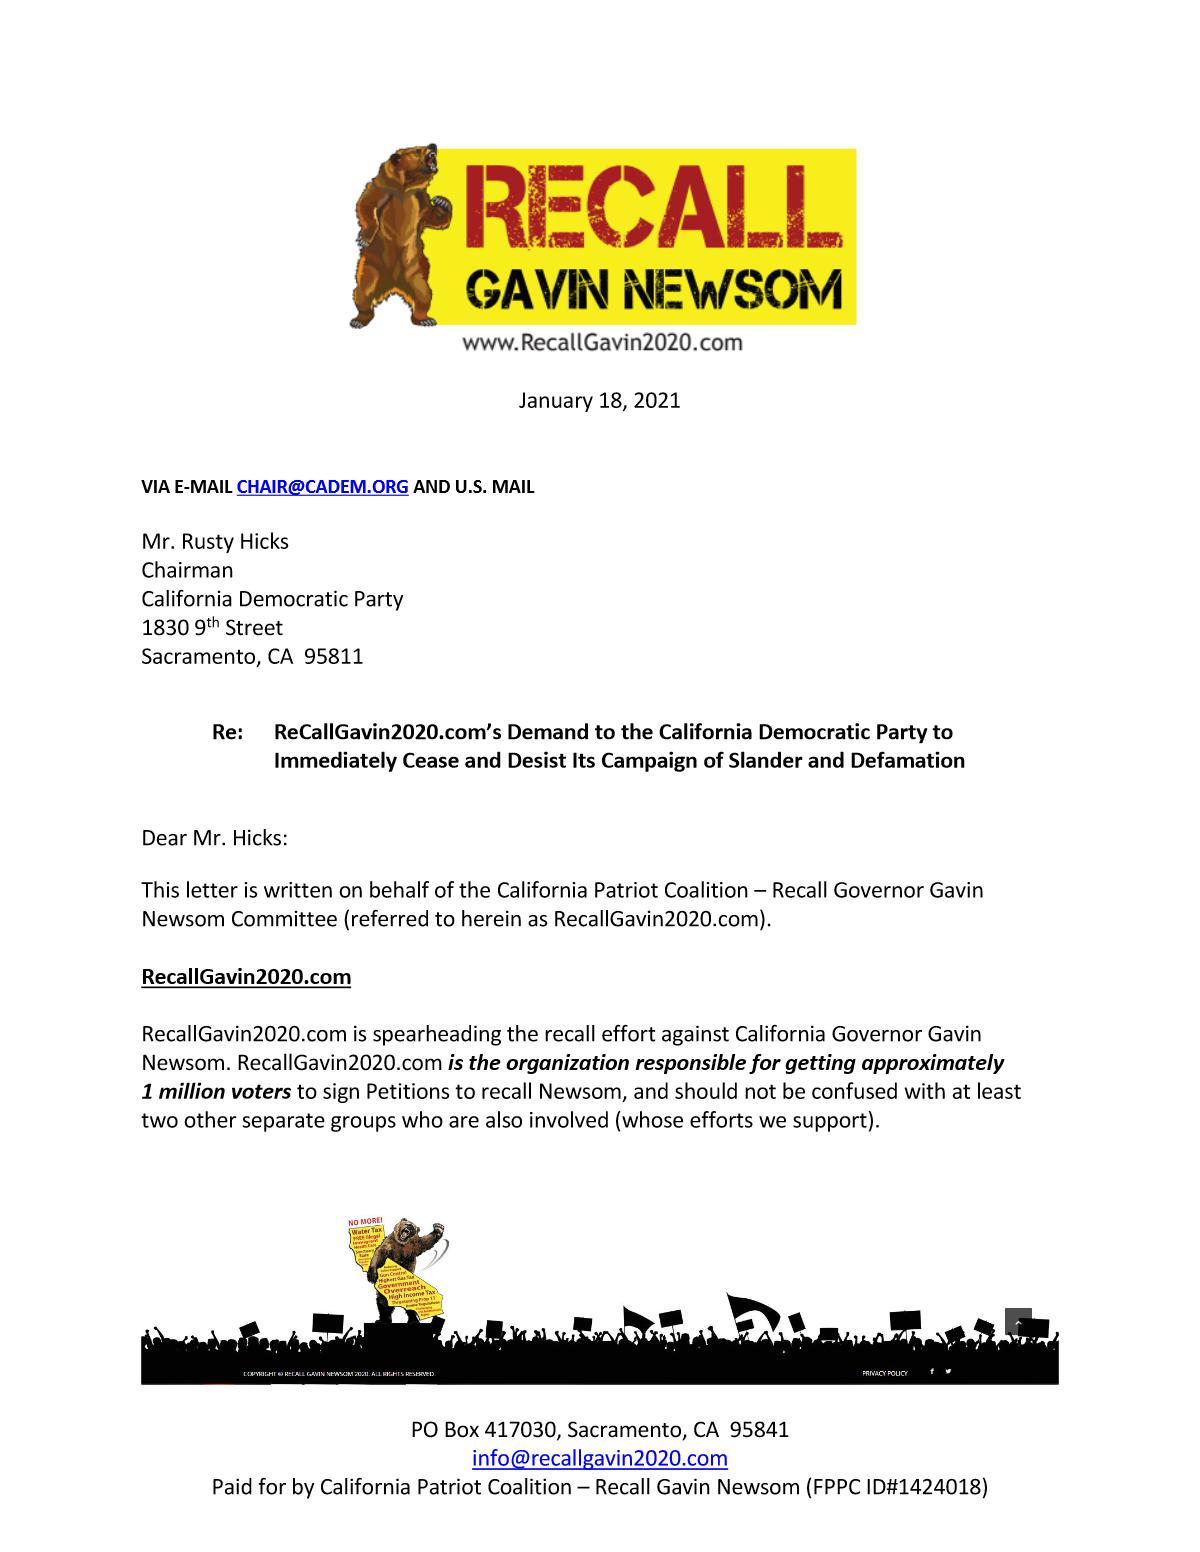 Recallgavin2020.com: Dems must cease and desist defaming recall supporters